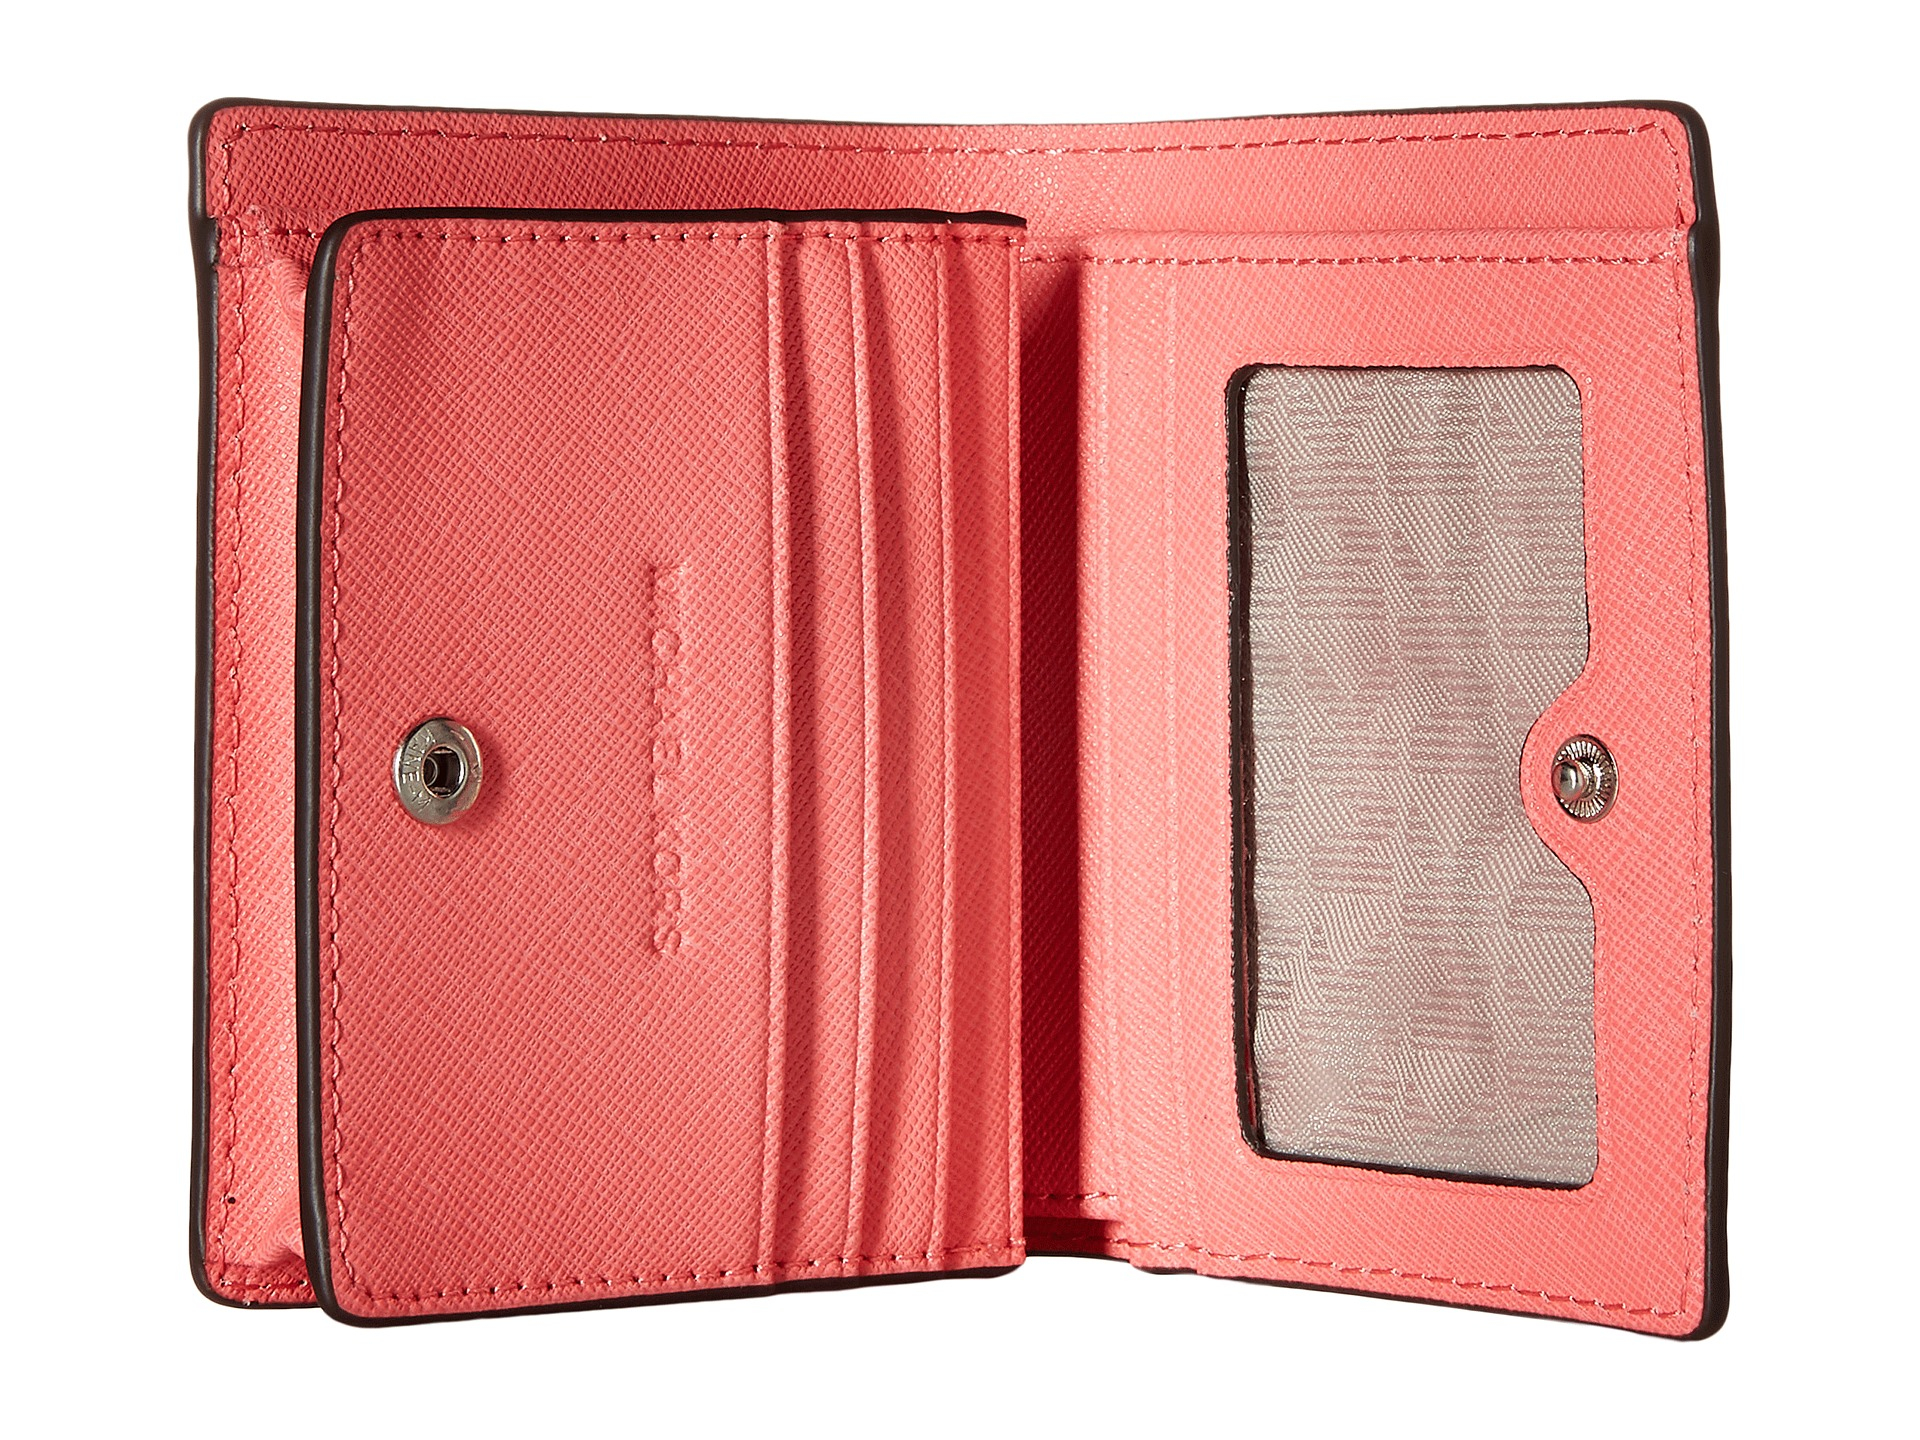 b4be41d19a25 Lyst - MICHAEL Michael Kors Jet Set Travel Flap Card Holder in Pink